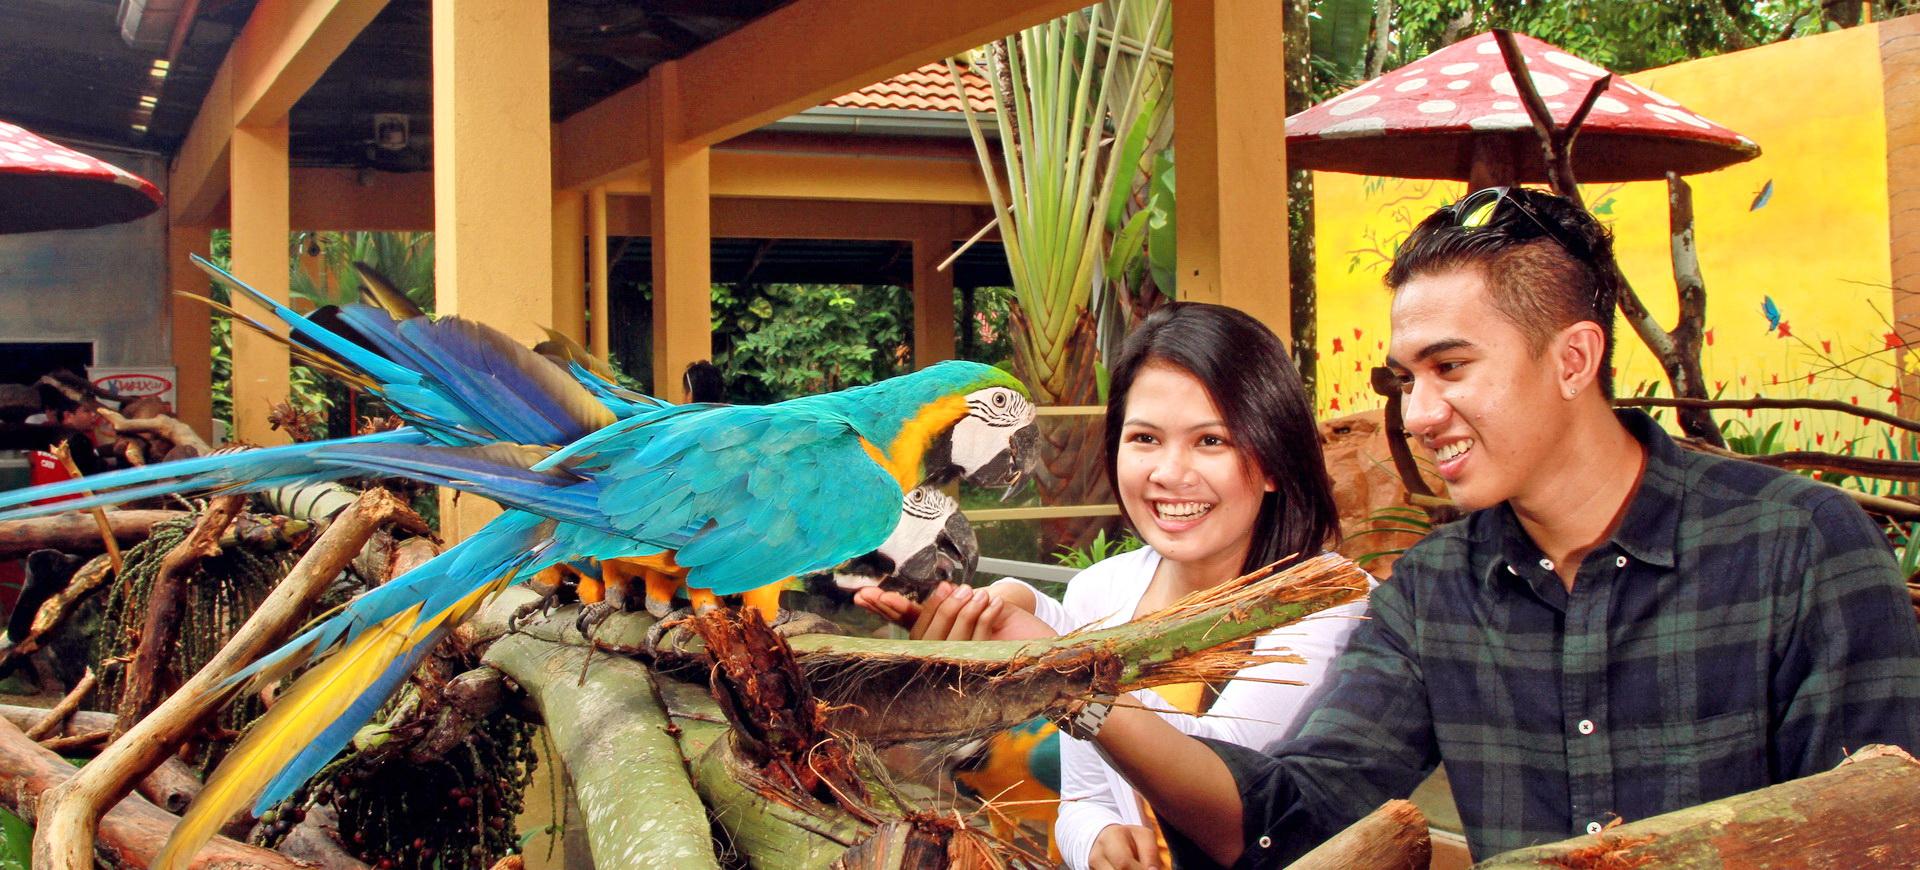 Conseils pratiques Malaisie et Bornéo